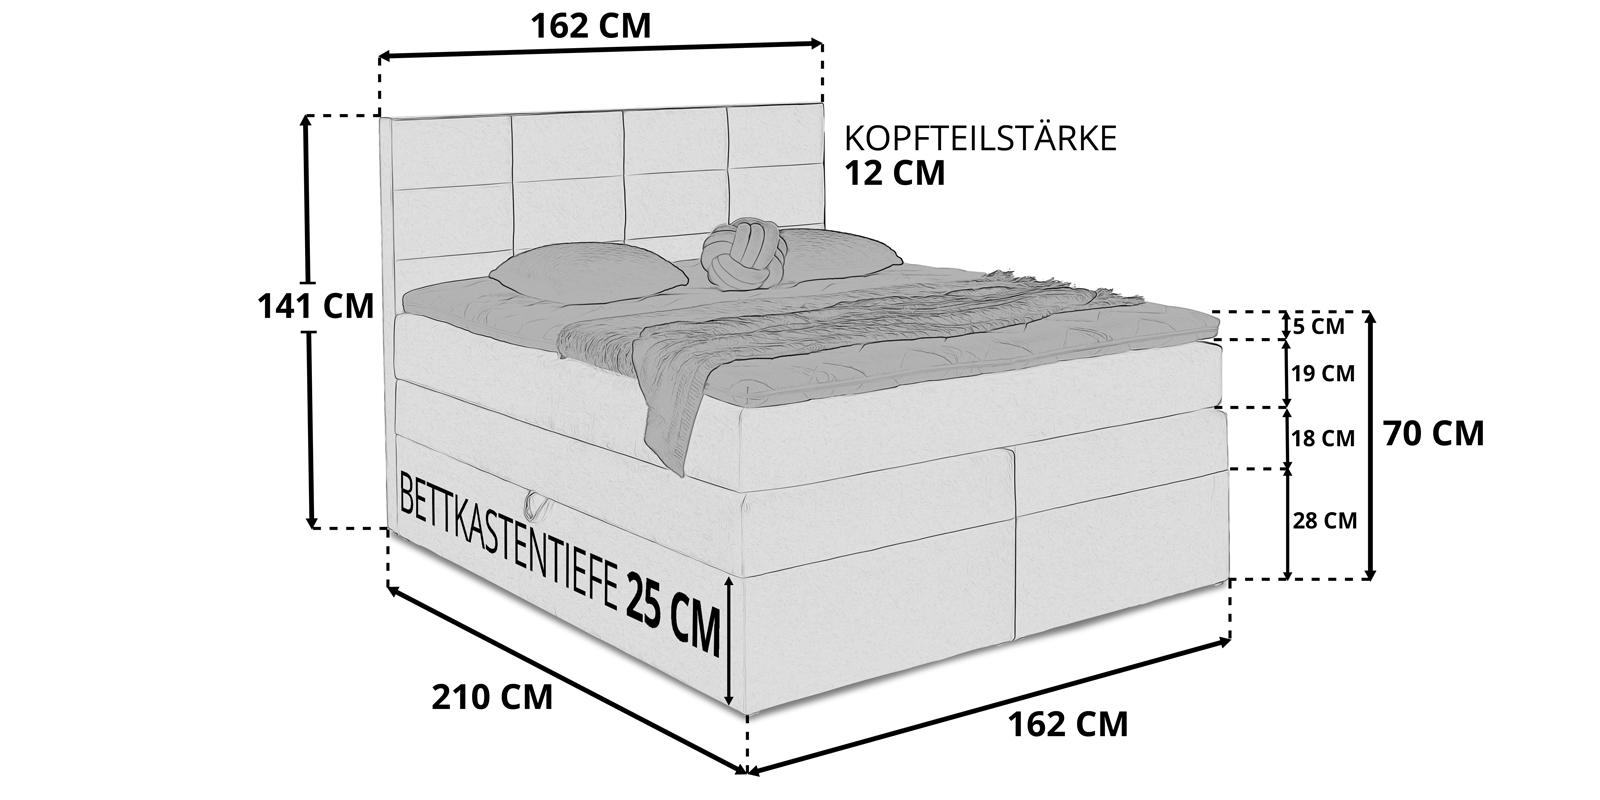 Boxspringbett Bettkasten Stauraum Bella 160x200 Skizze